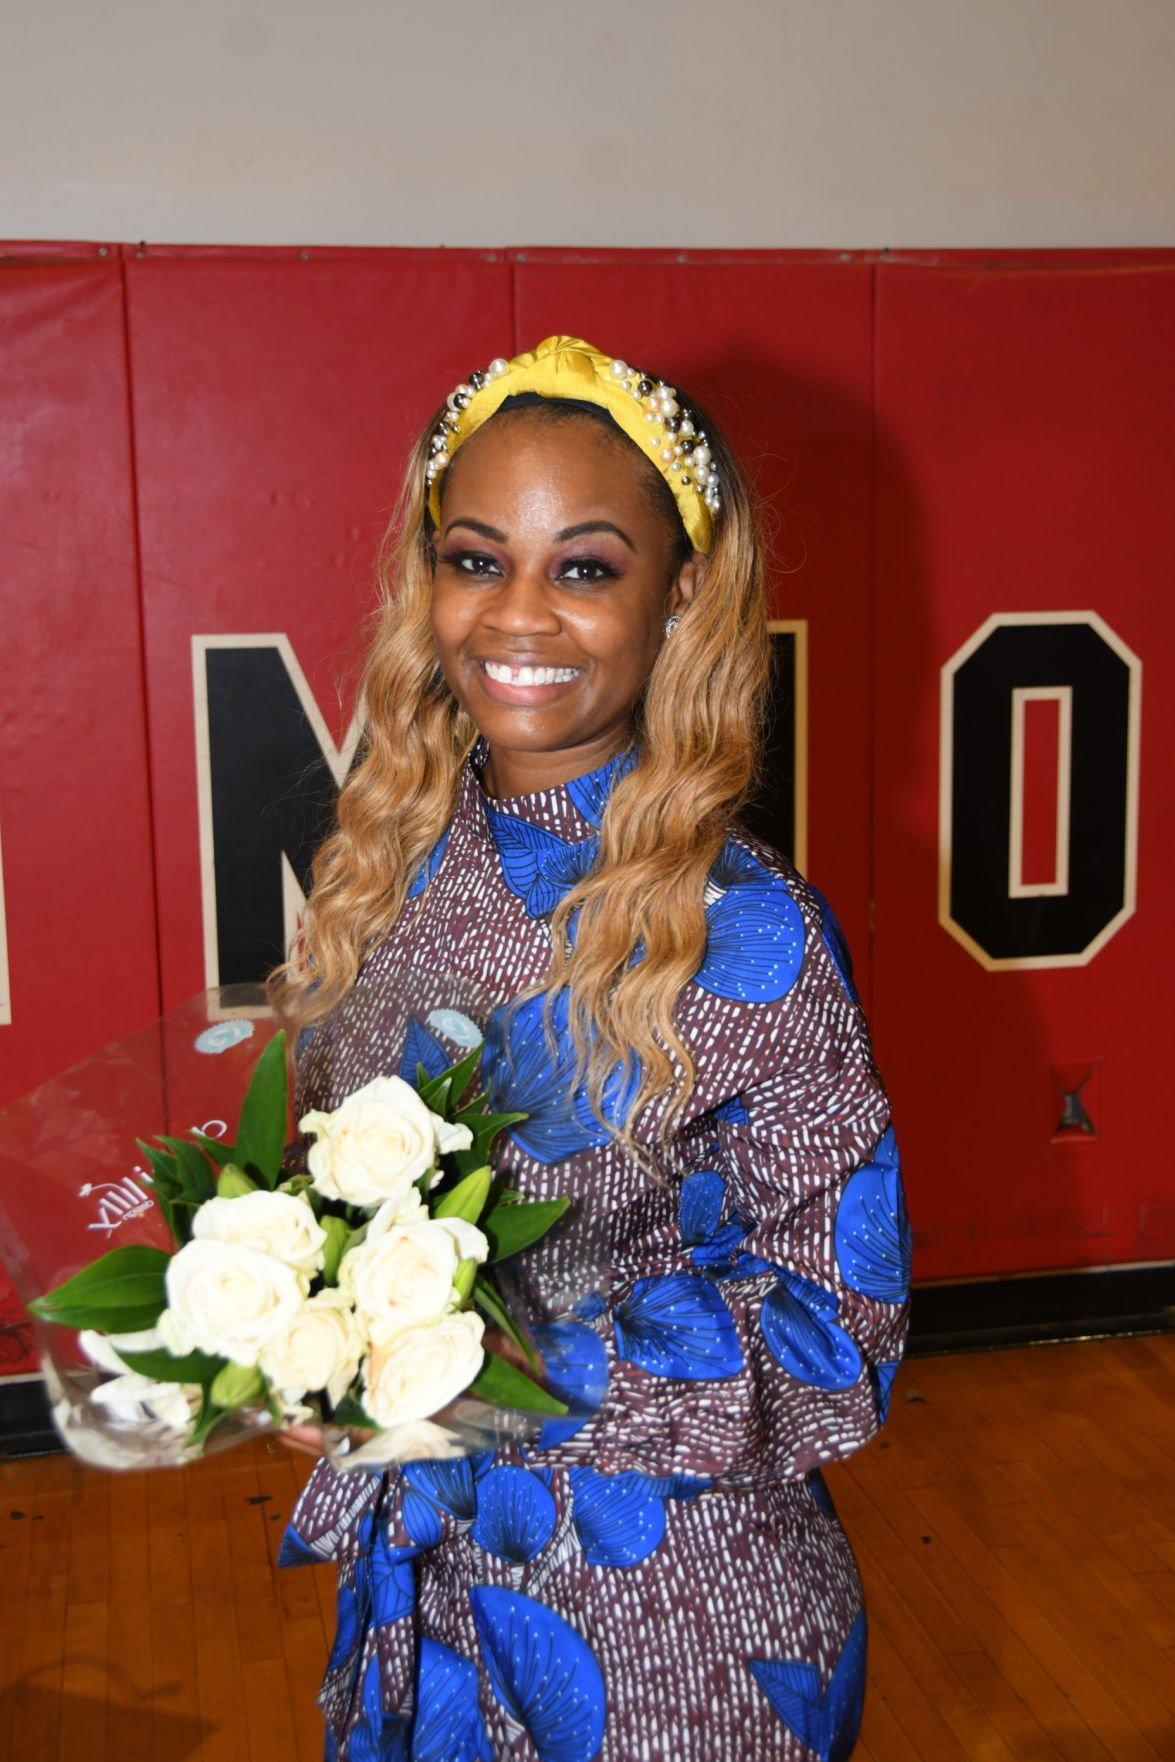 Imhotep teacher celebrated for teacher of the year honor